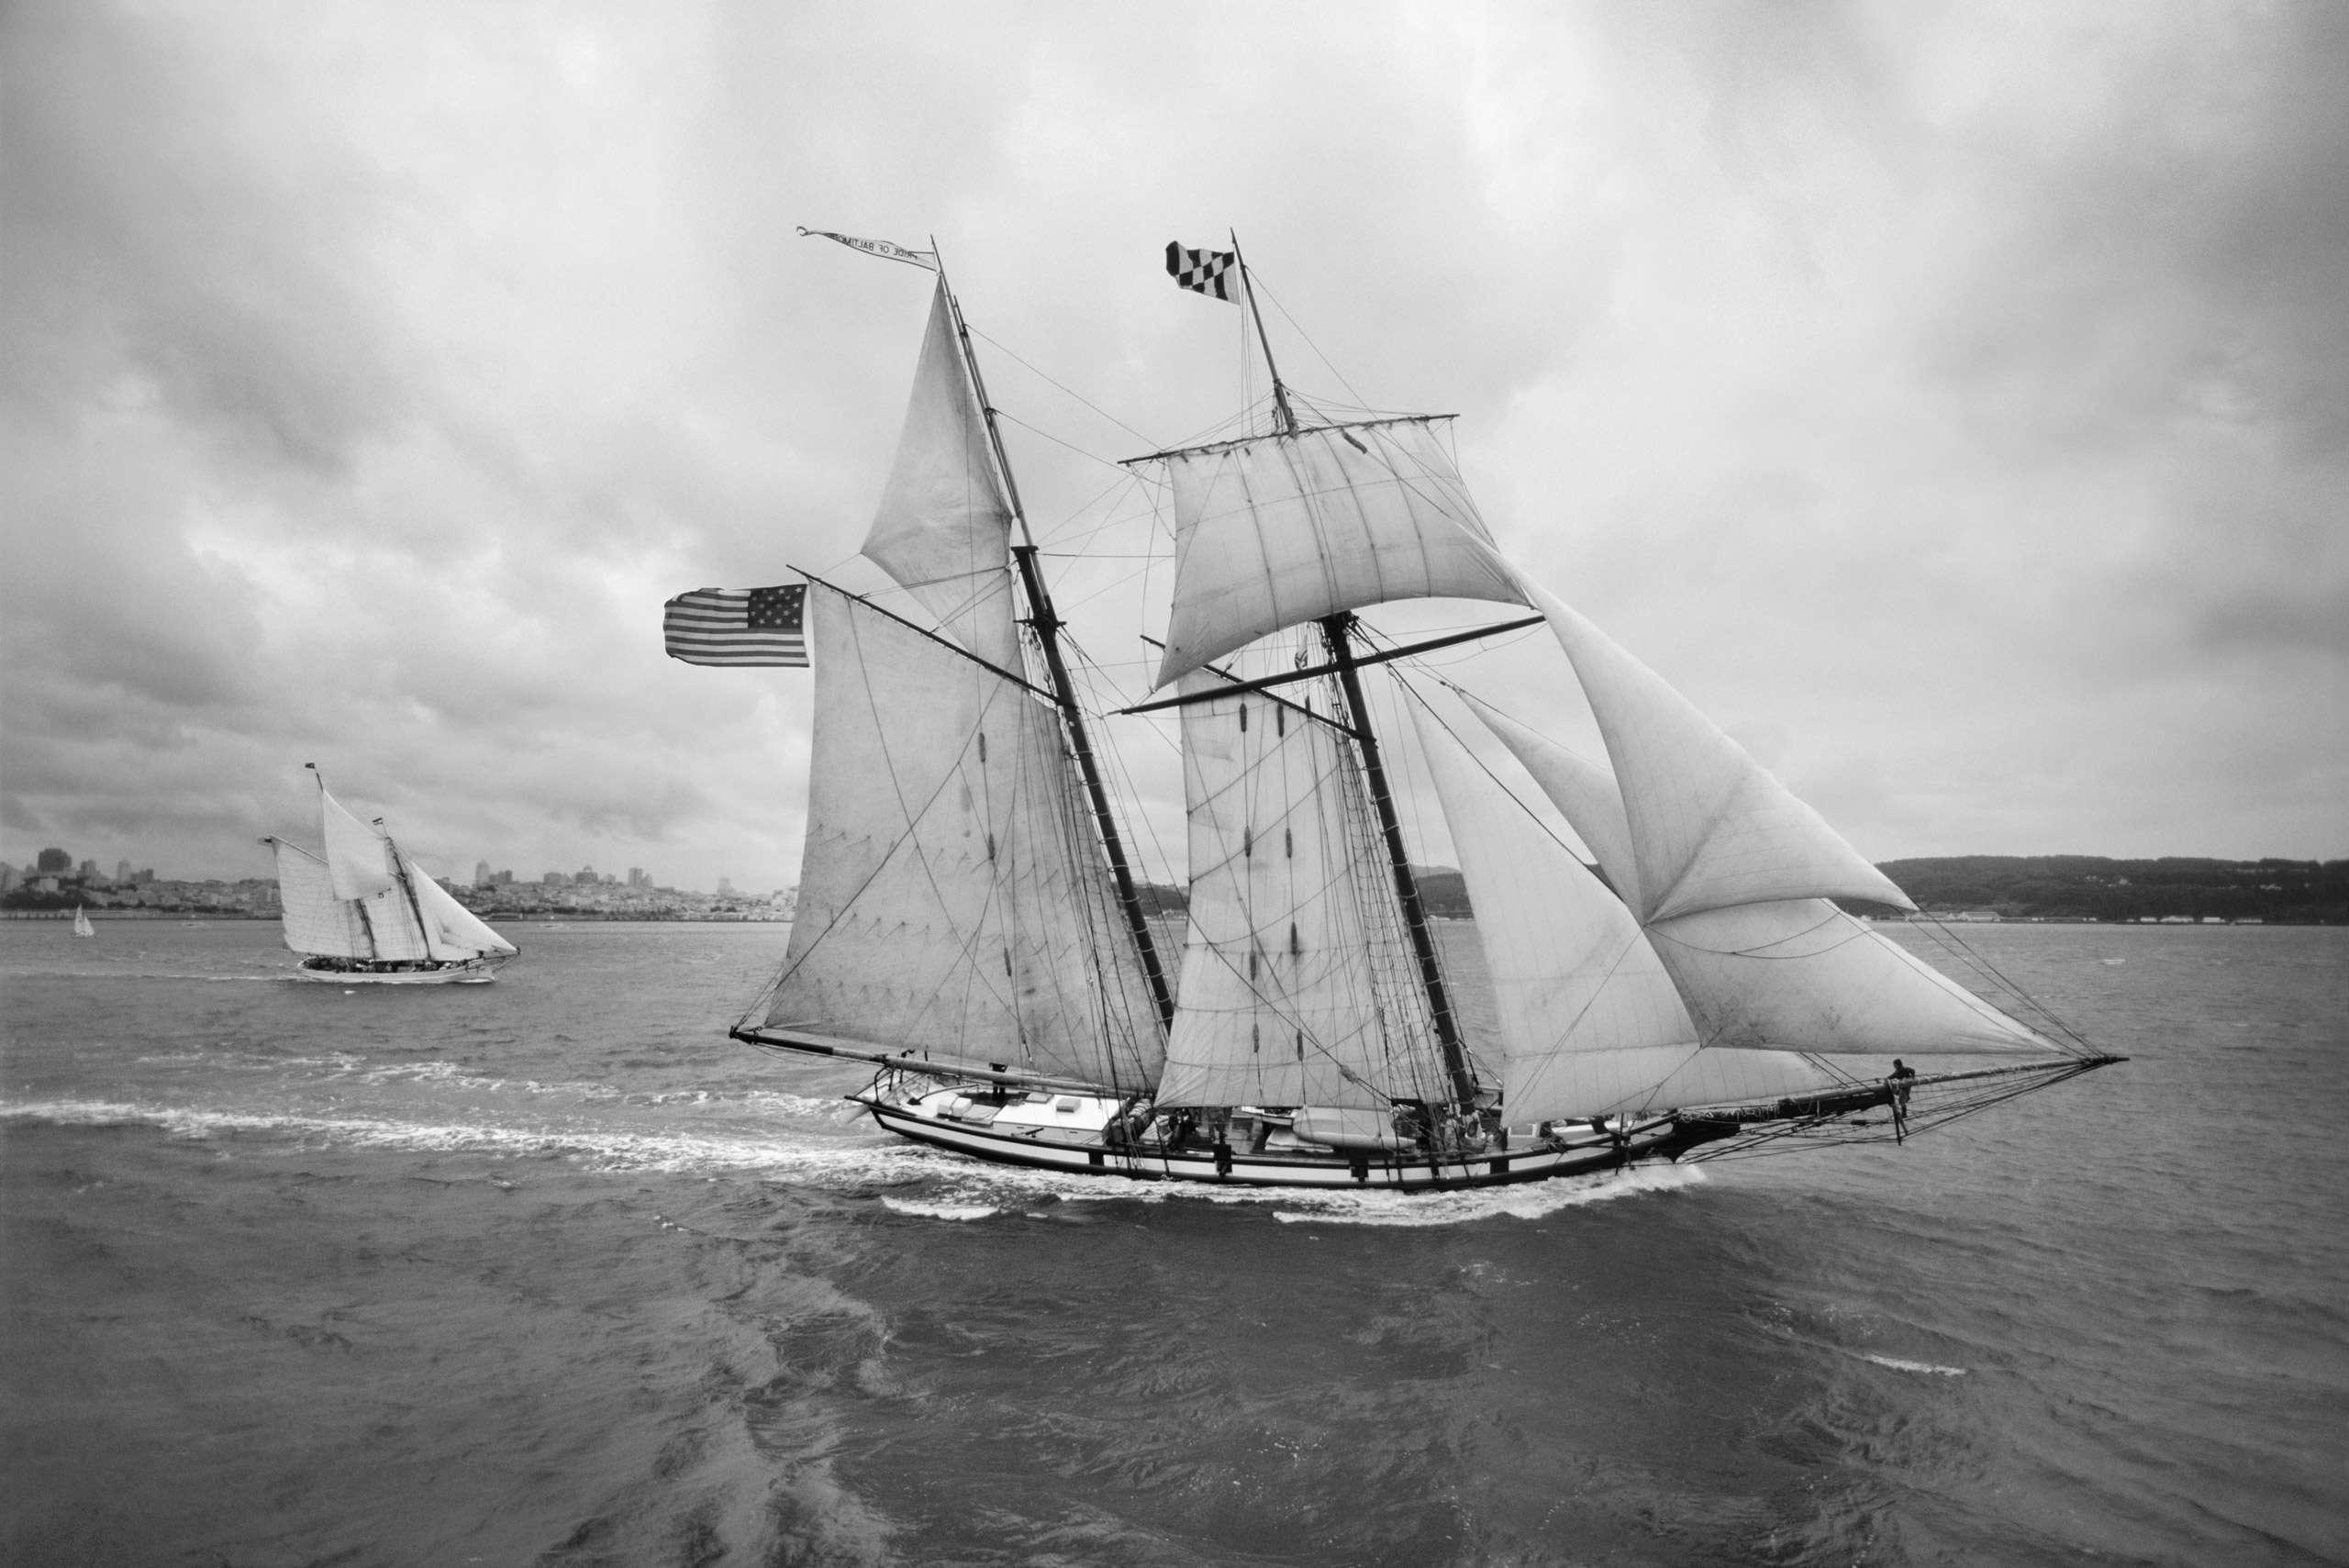 PORTFOLIO - Maritime #7 - B&W - PCG348